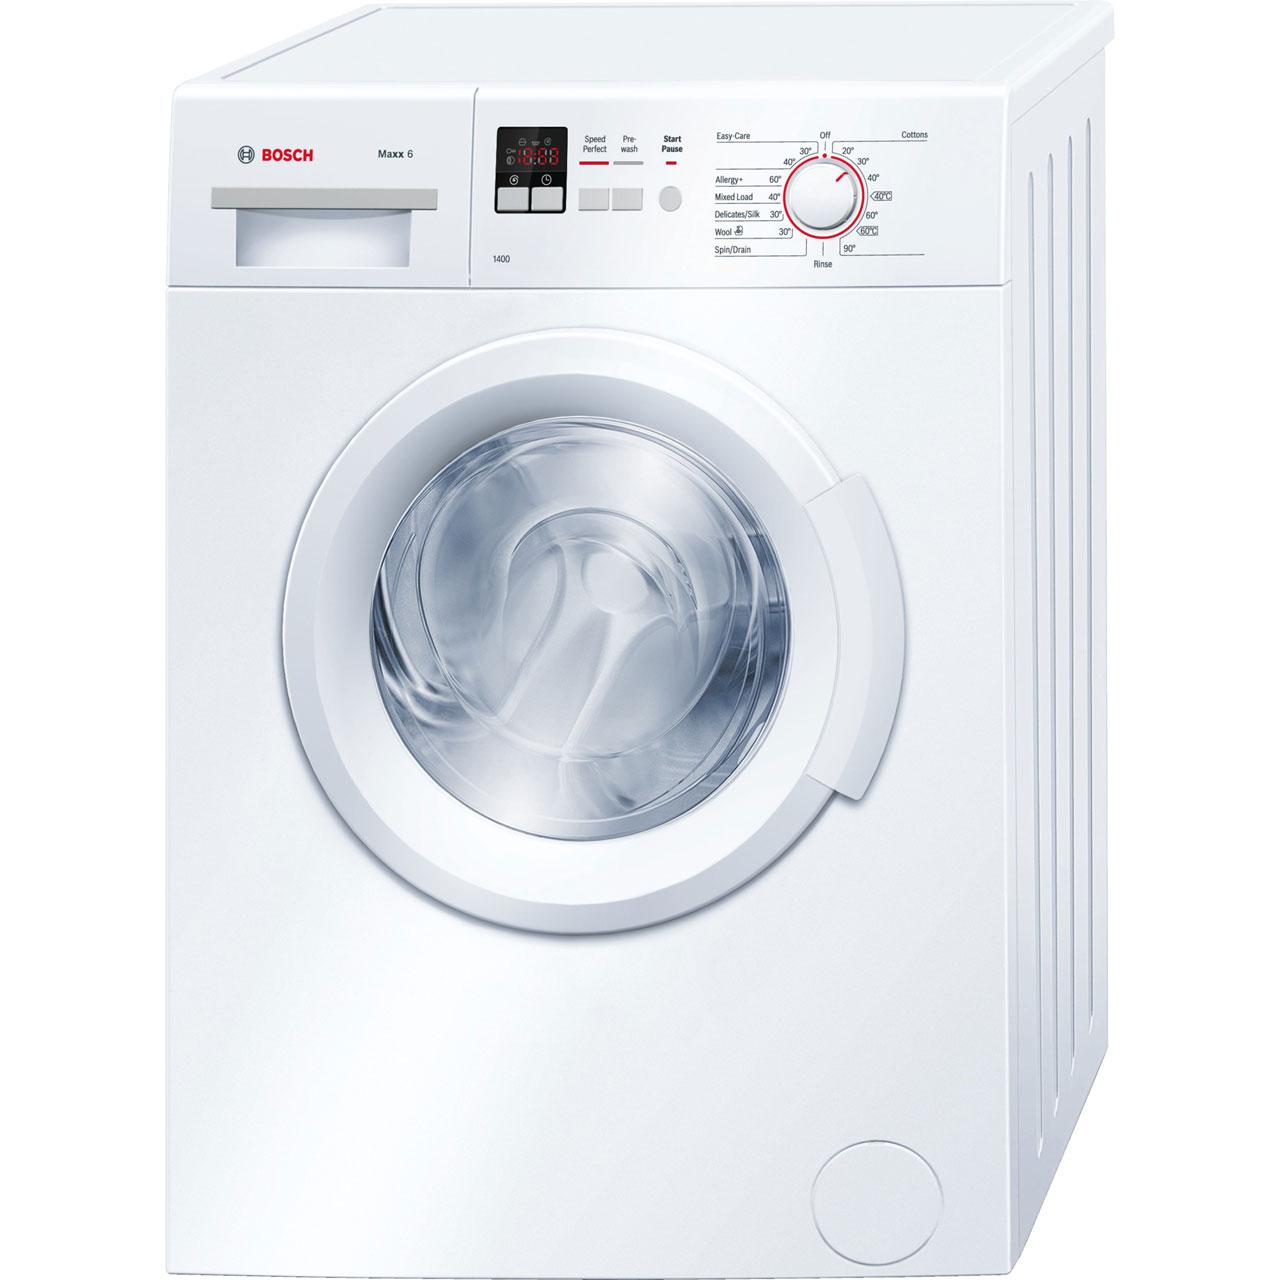 Bosch Serie 2 WAB28161GB 6Kg Washing Machine review